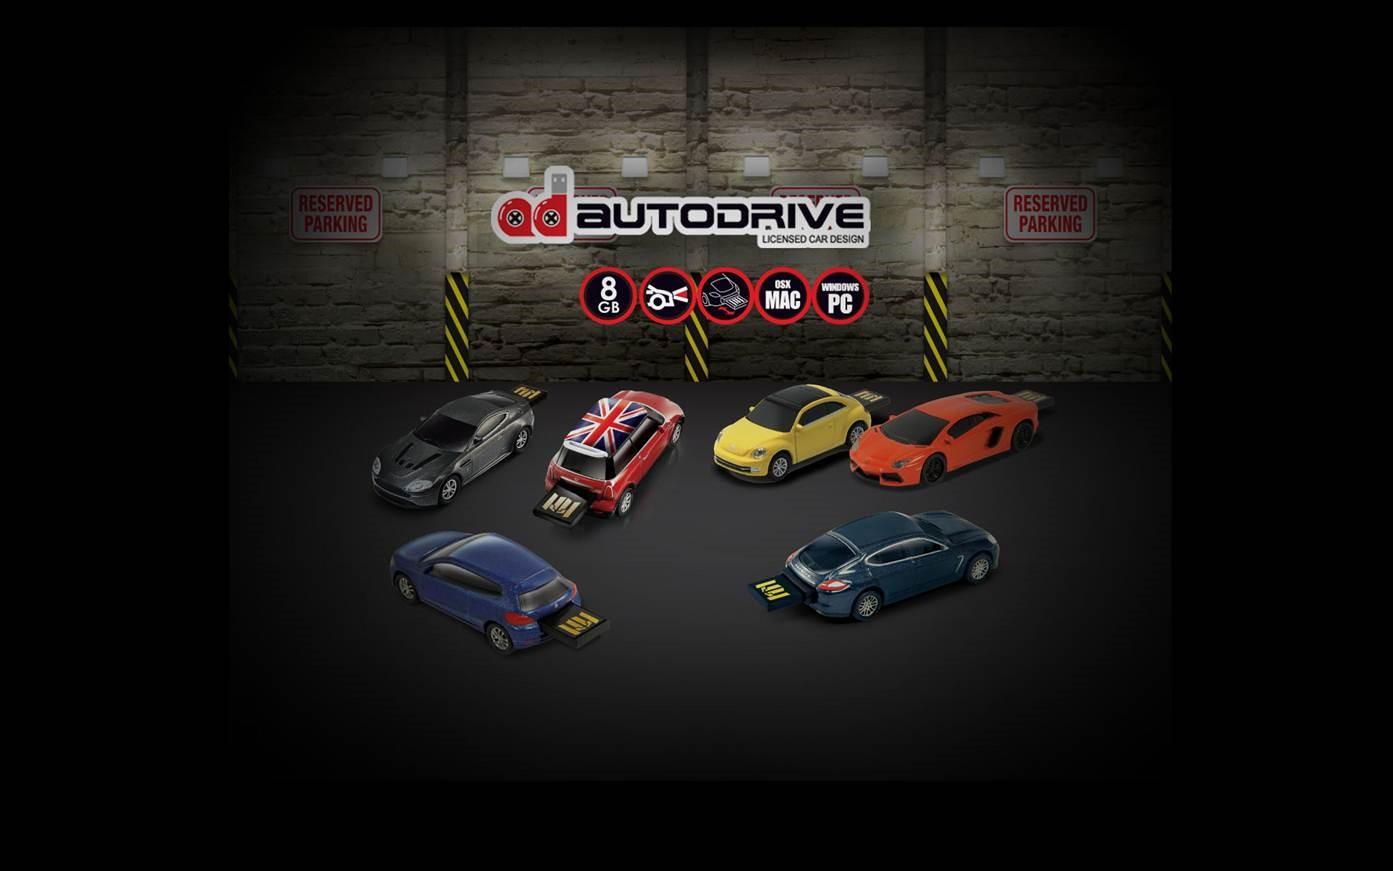 http://www.pendrive.com.my/autodrive USB flash drive